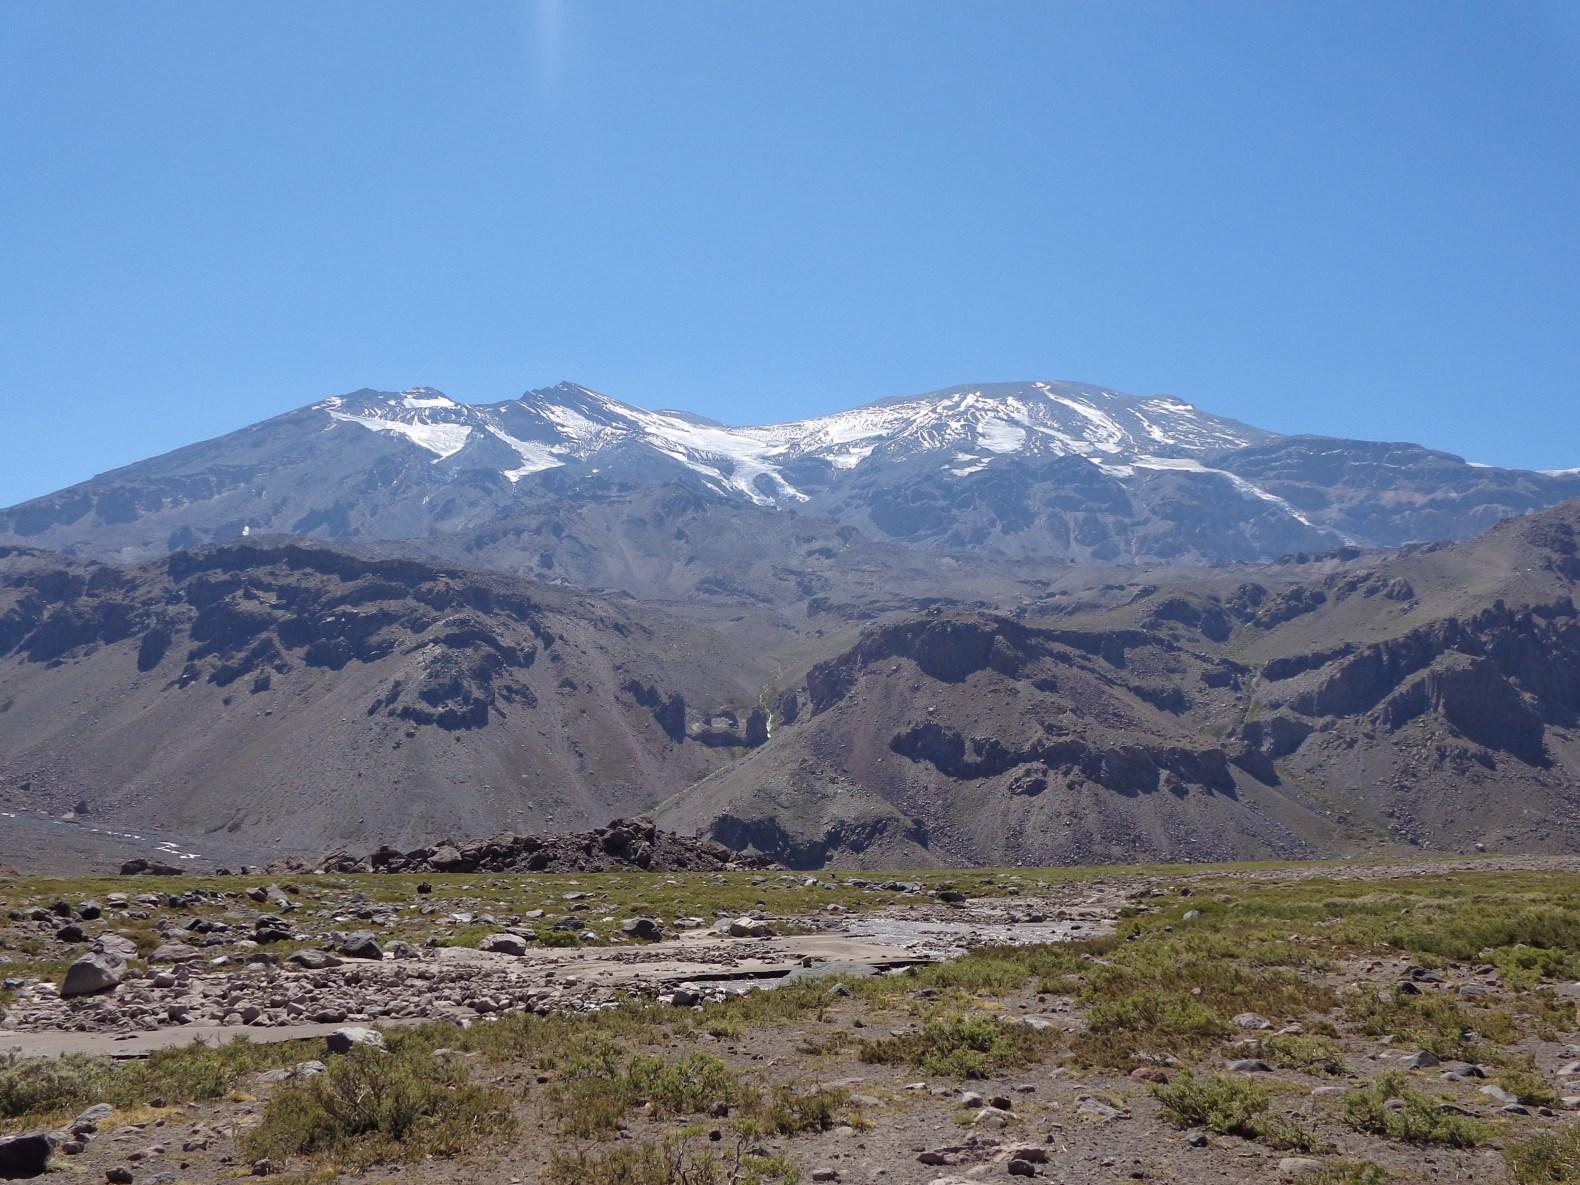 Ascenso Volcán San José -1 a 4 de Noviembre